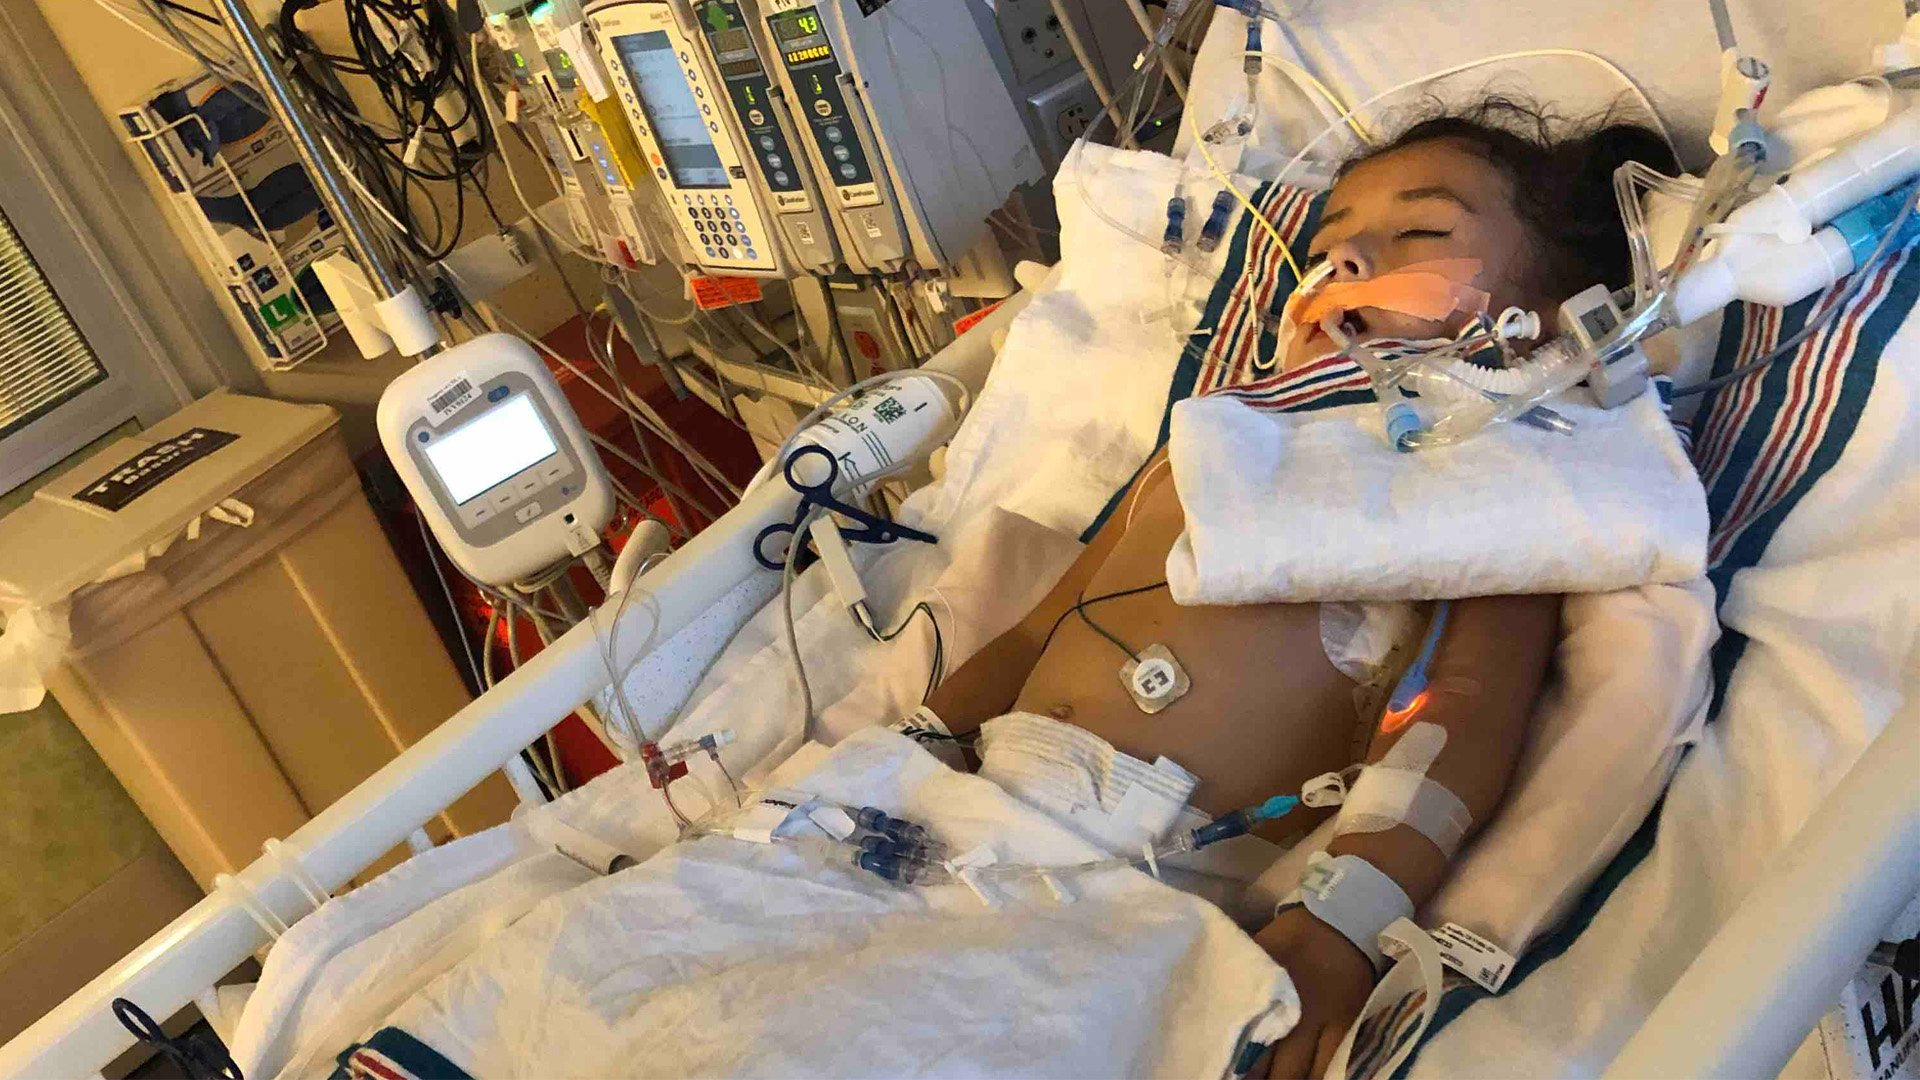 Aliyah Cardoza, 3, was hospitalized with a strain of the Coronavirus on Dec. 23, 2019. (Credit: GoFundMe)